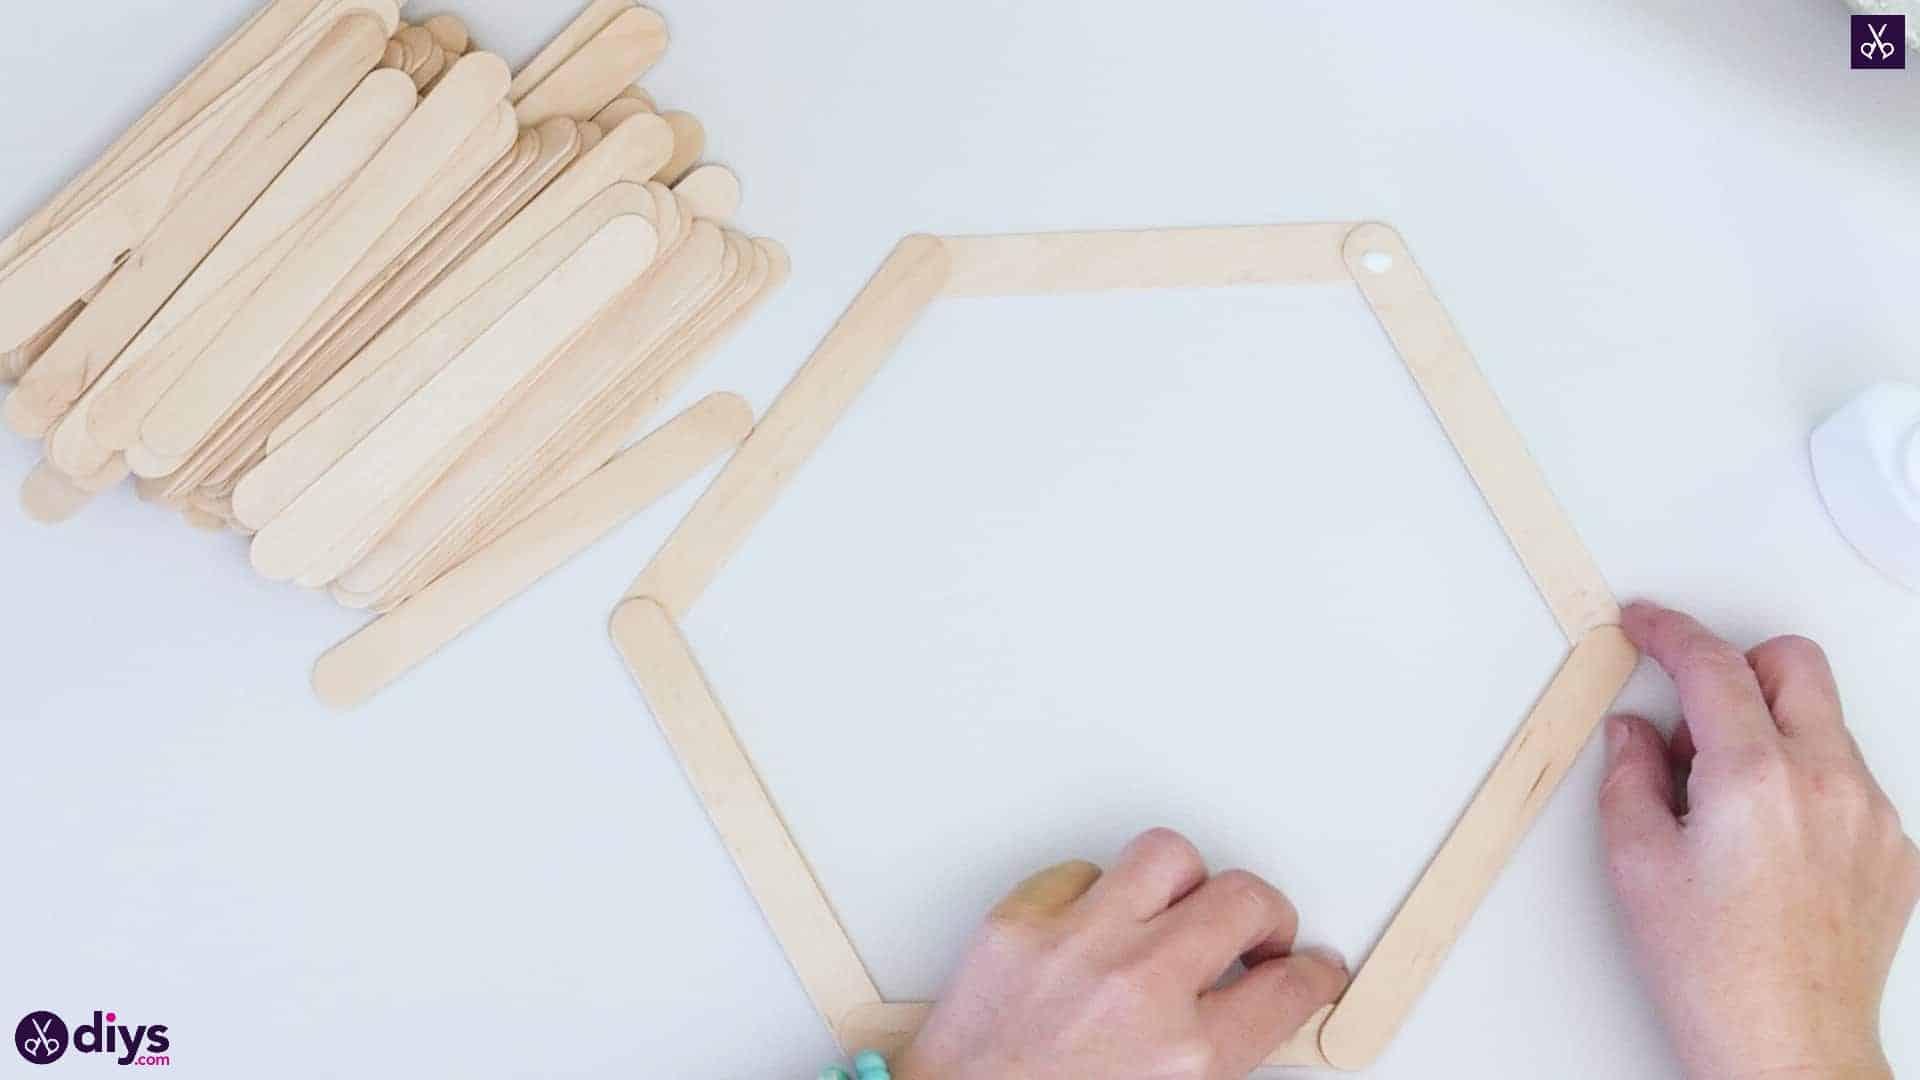 Diy popsicle stick hexagon shelf step 2c